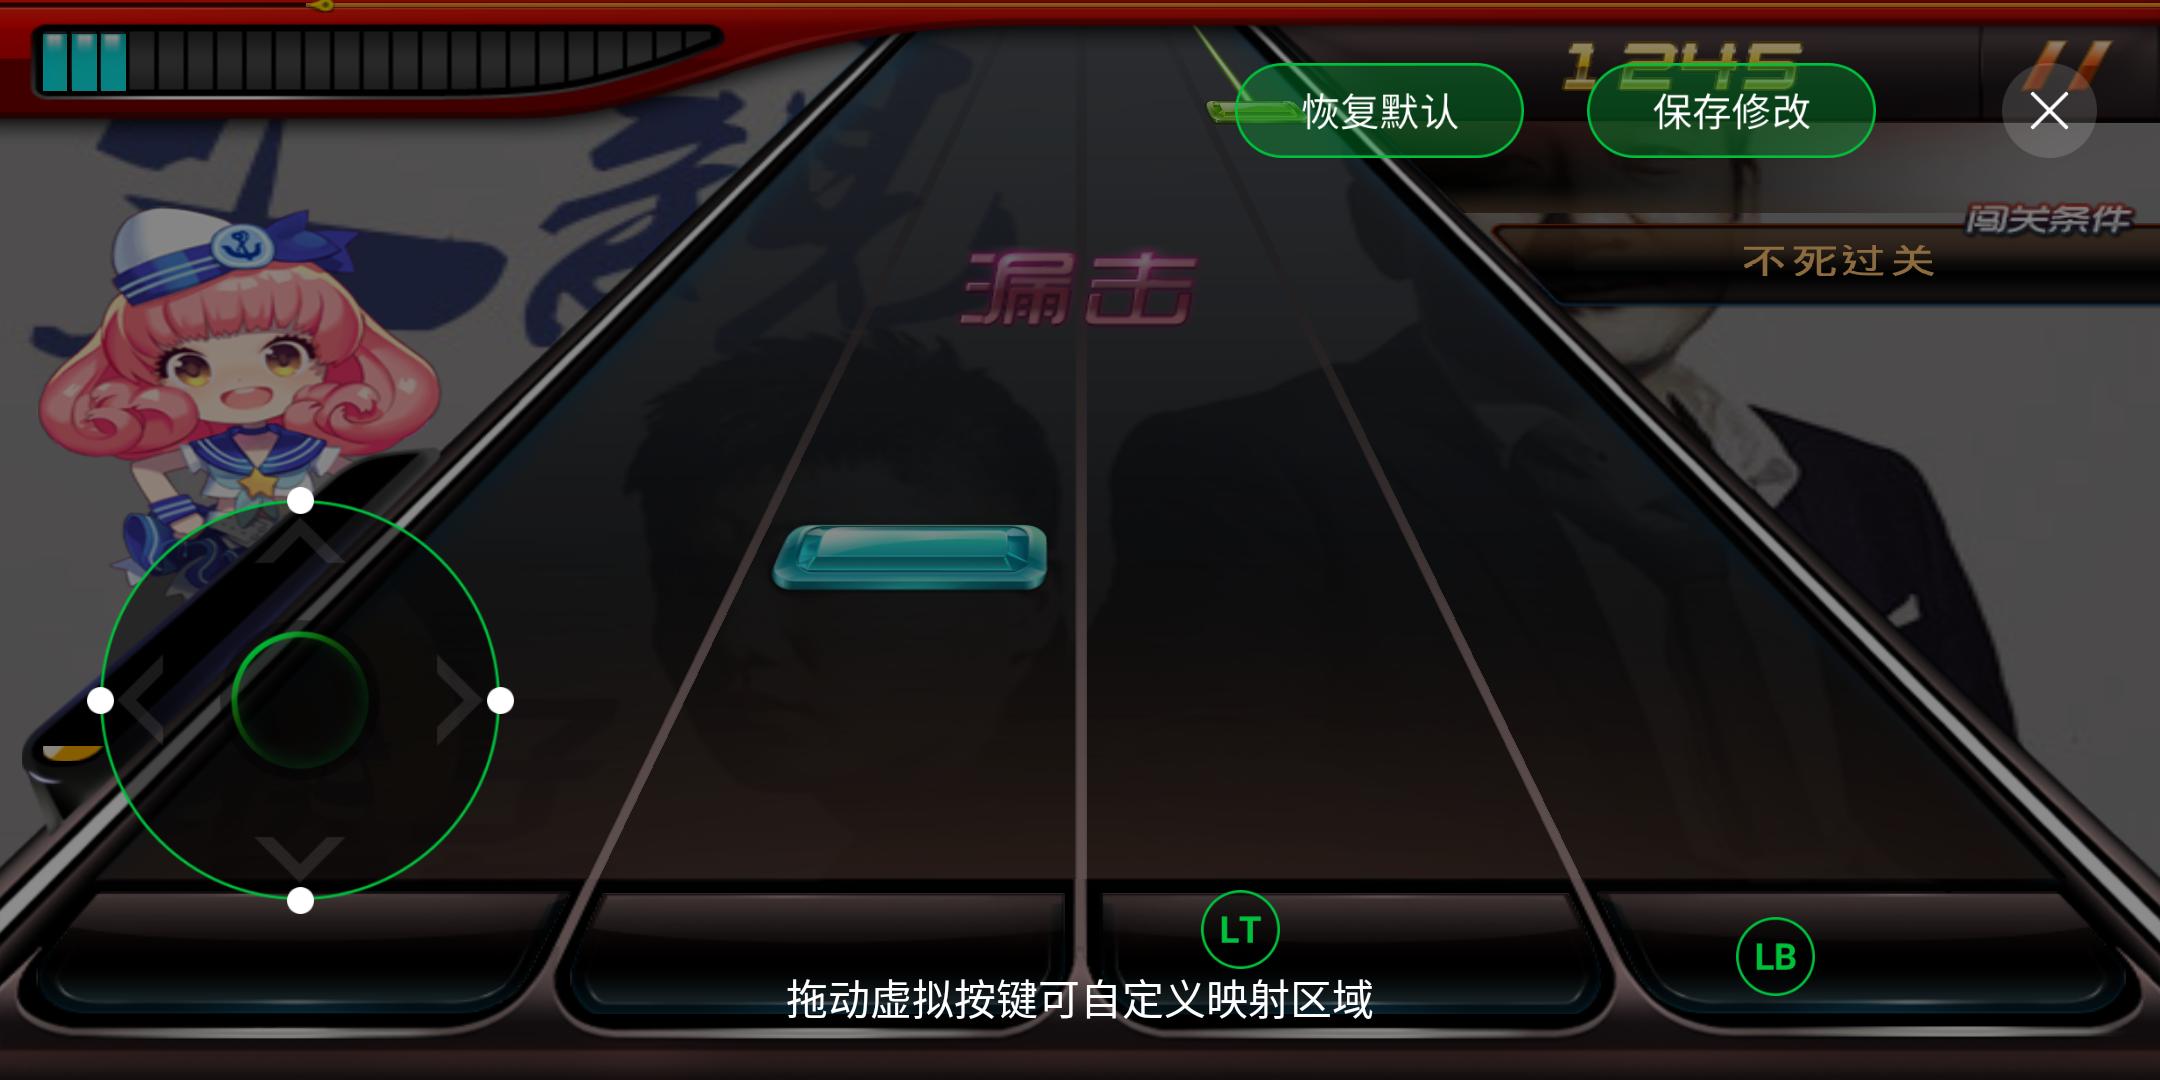 Screenshot_2018-06-05-14-32-14-400_com.tencent.game.rhythmmaster.png